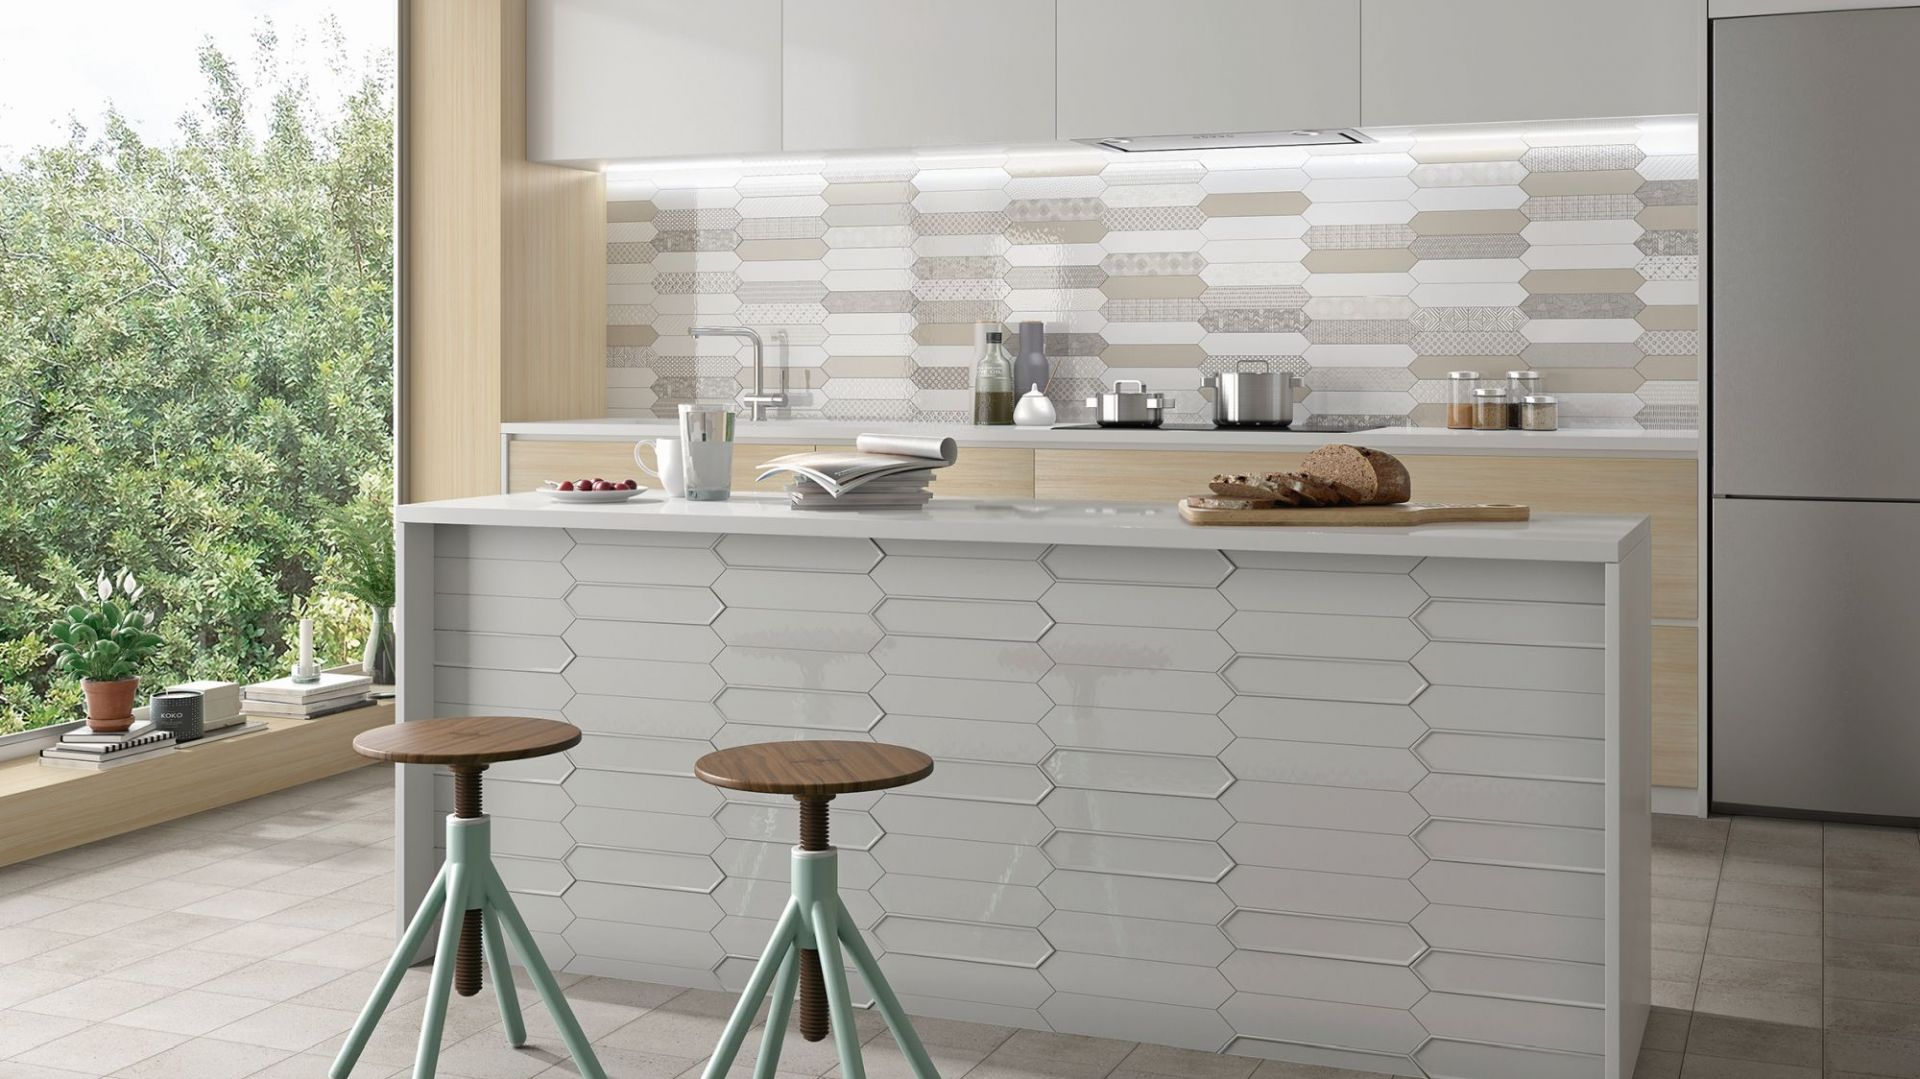 Płytki do kuchni marki Estudio Ceramico, kolekcja Naima. Fot. Estudio Ceramico